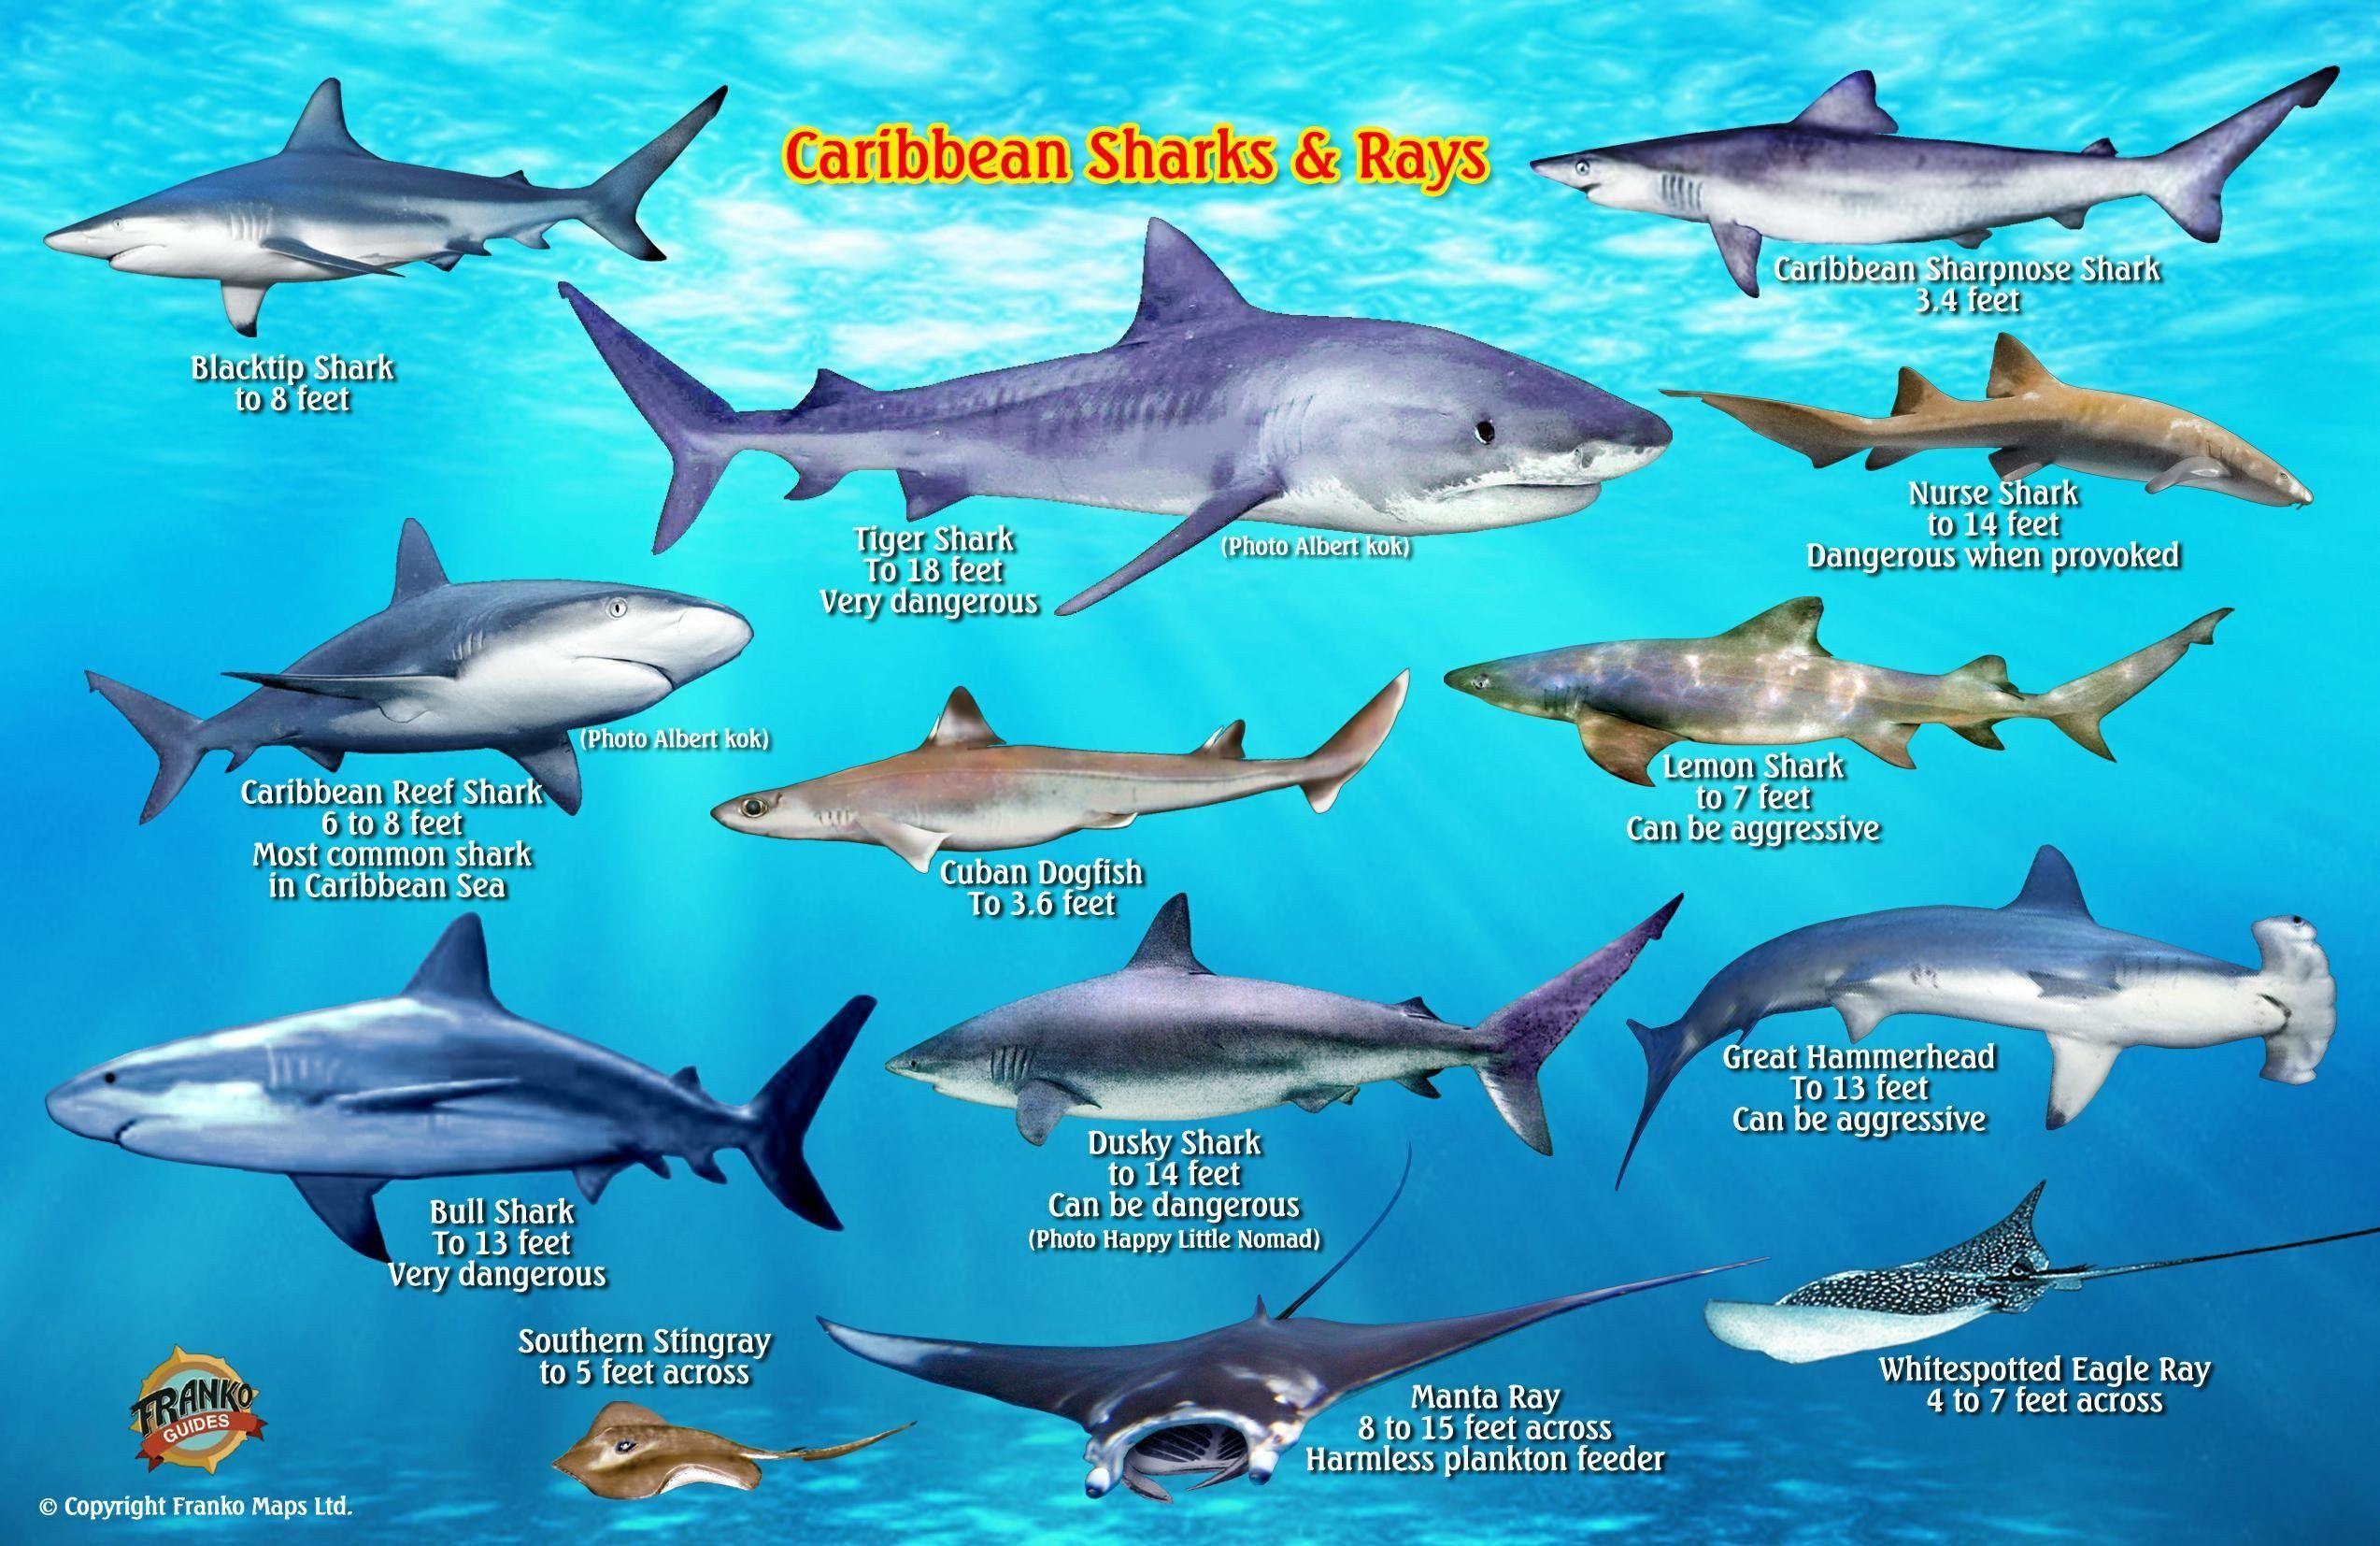 Franko Maps Caribbean Sharks Rays Creature Guide 5 5 X 8 5